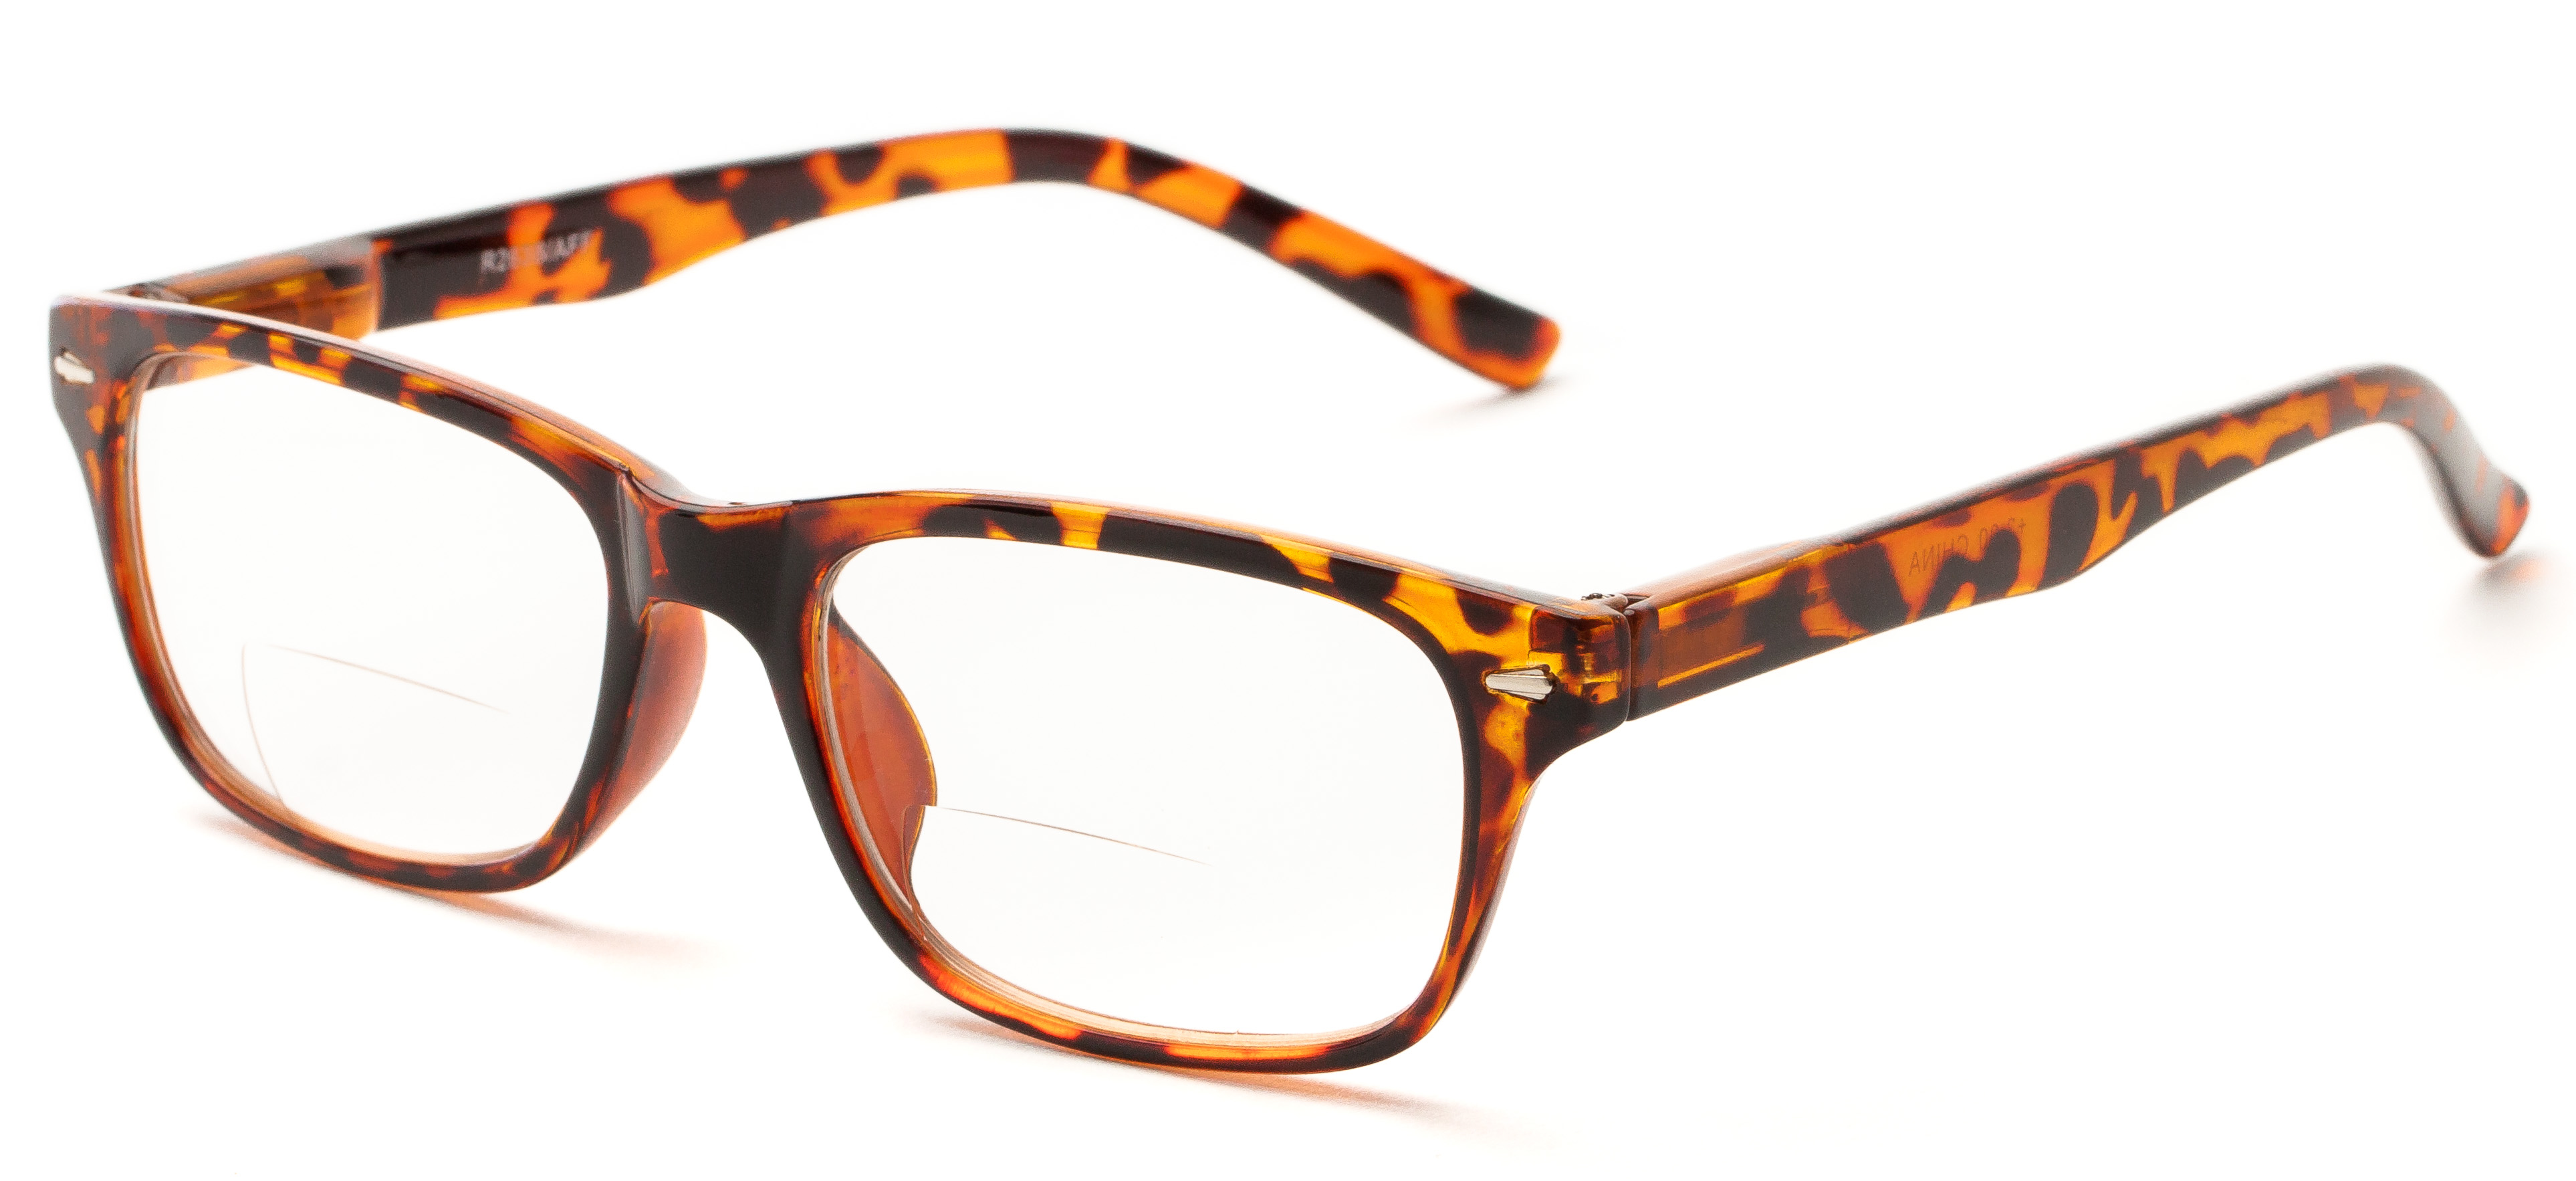 55220ab4e32 Readers.com The Williamsburg Bifocal Rectangle Bifocal Reading Glasses  Simple   Timeless - Walmart.com